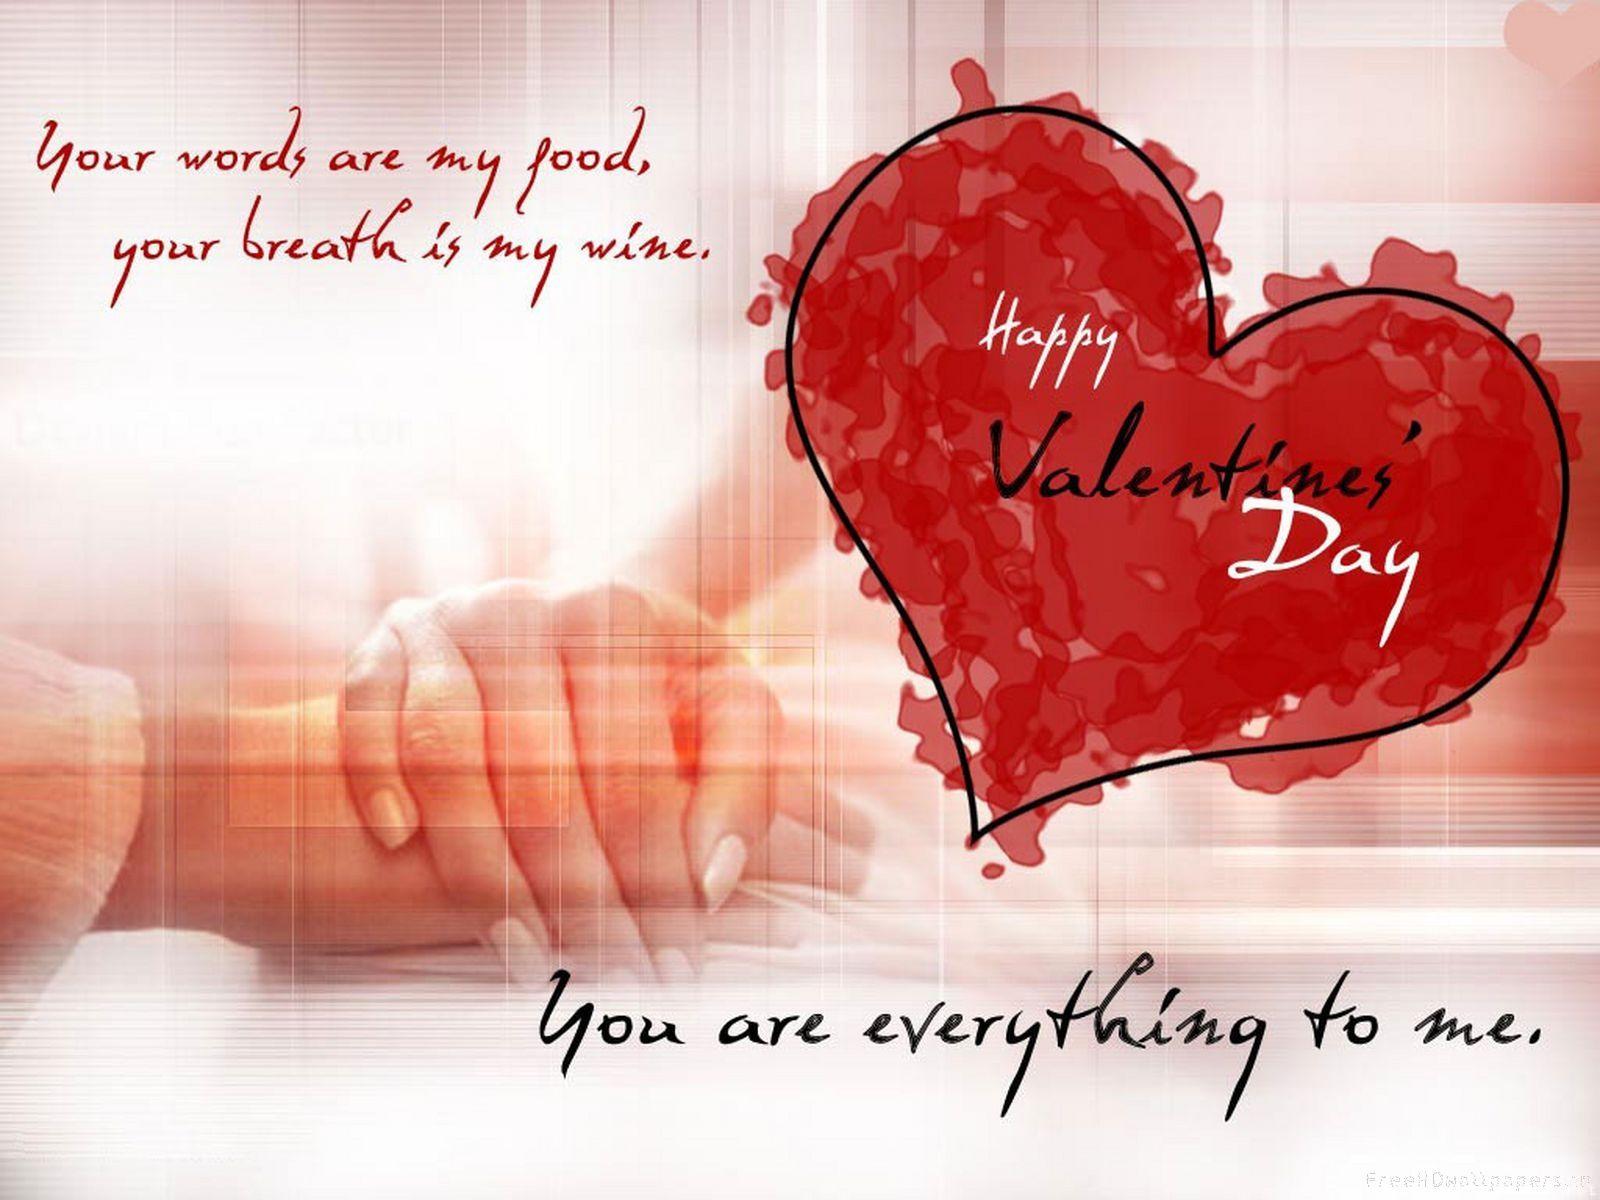 happy valintene my love new valentines day cards picture valentines day hd wallpaper 2013 - Valentine Love Cards